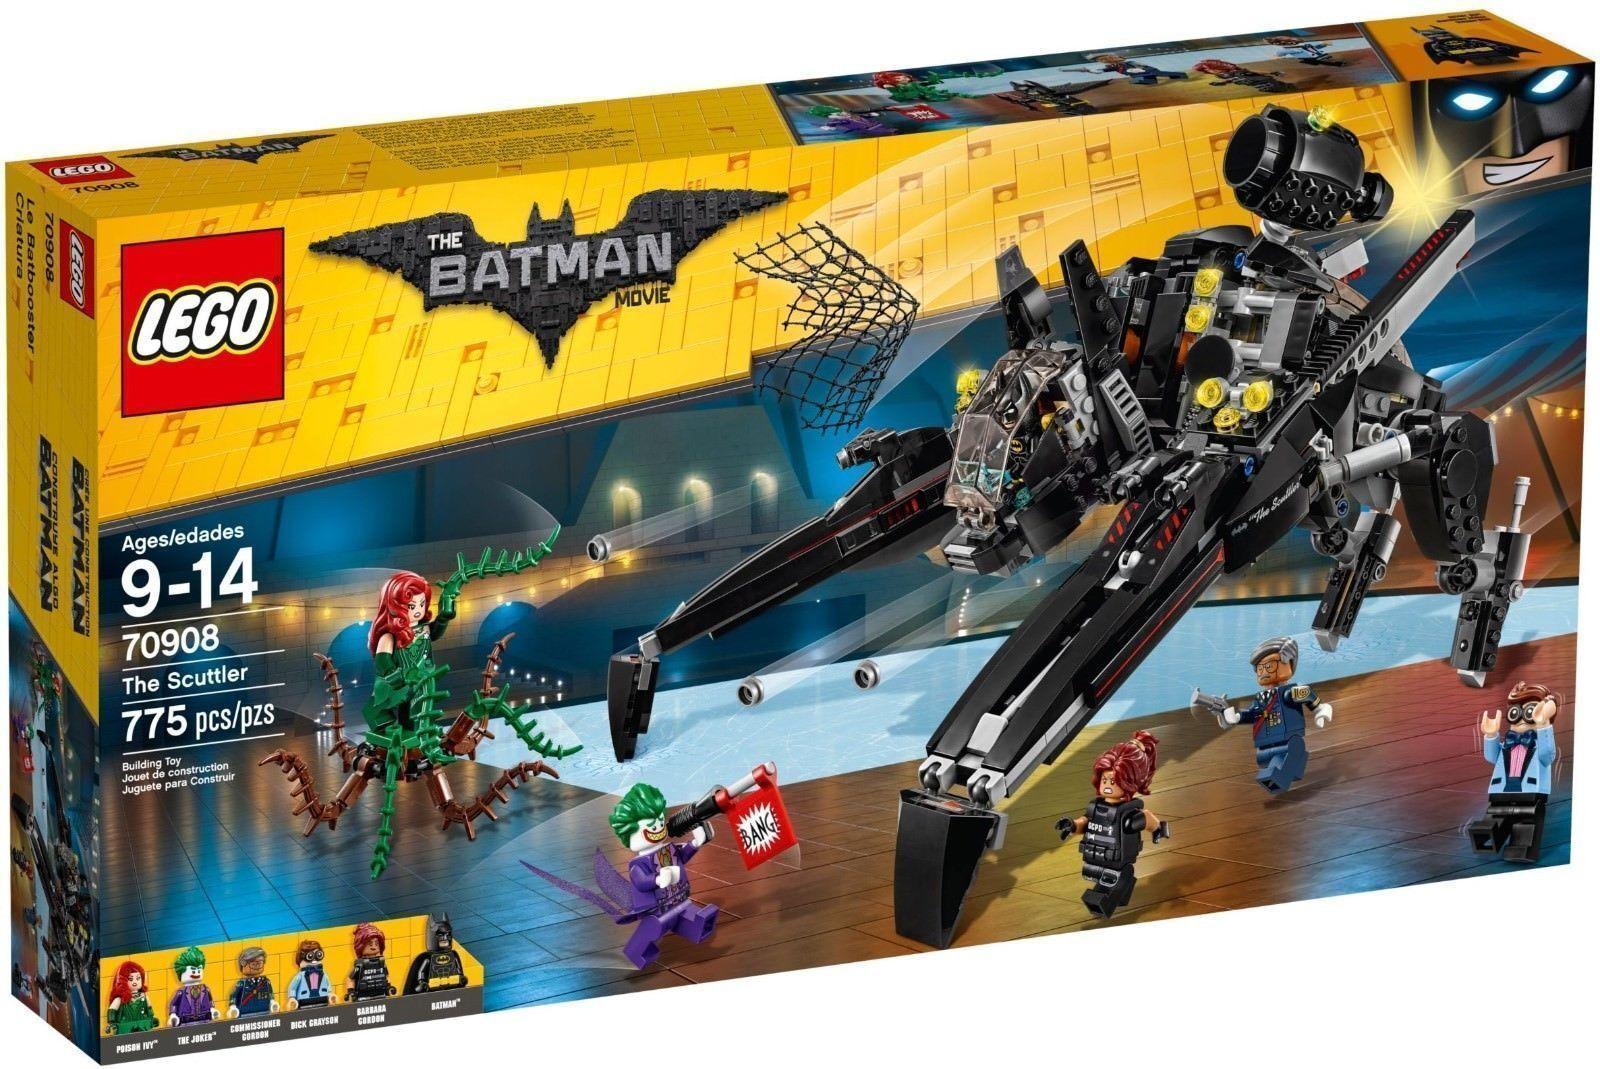 LEGO BATMAN MOVIE - 70908 - THE SCUTTLER BRAND NEW & SEALED